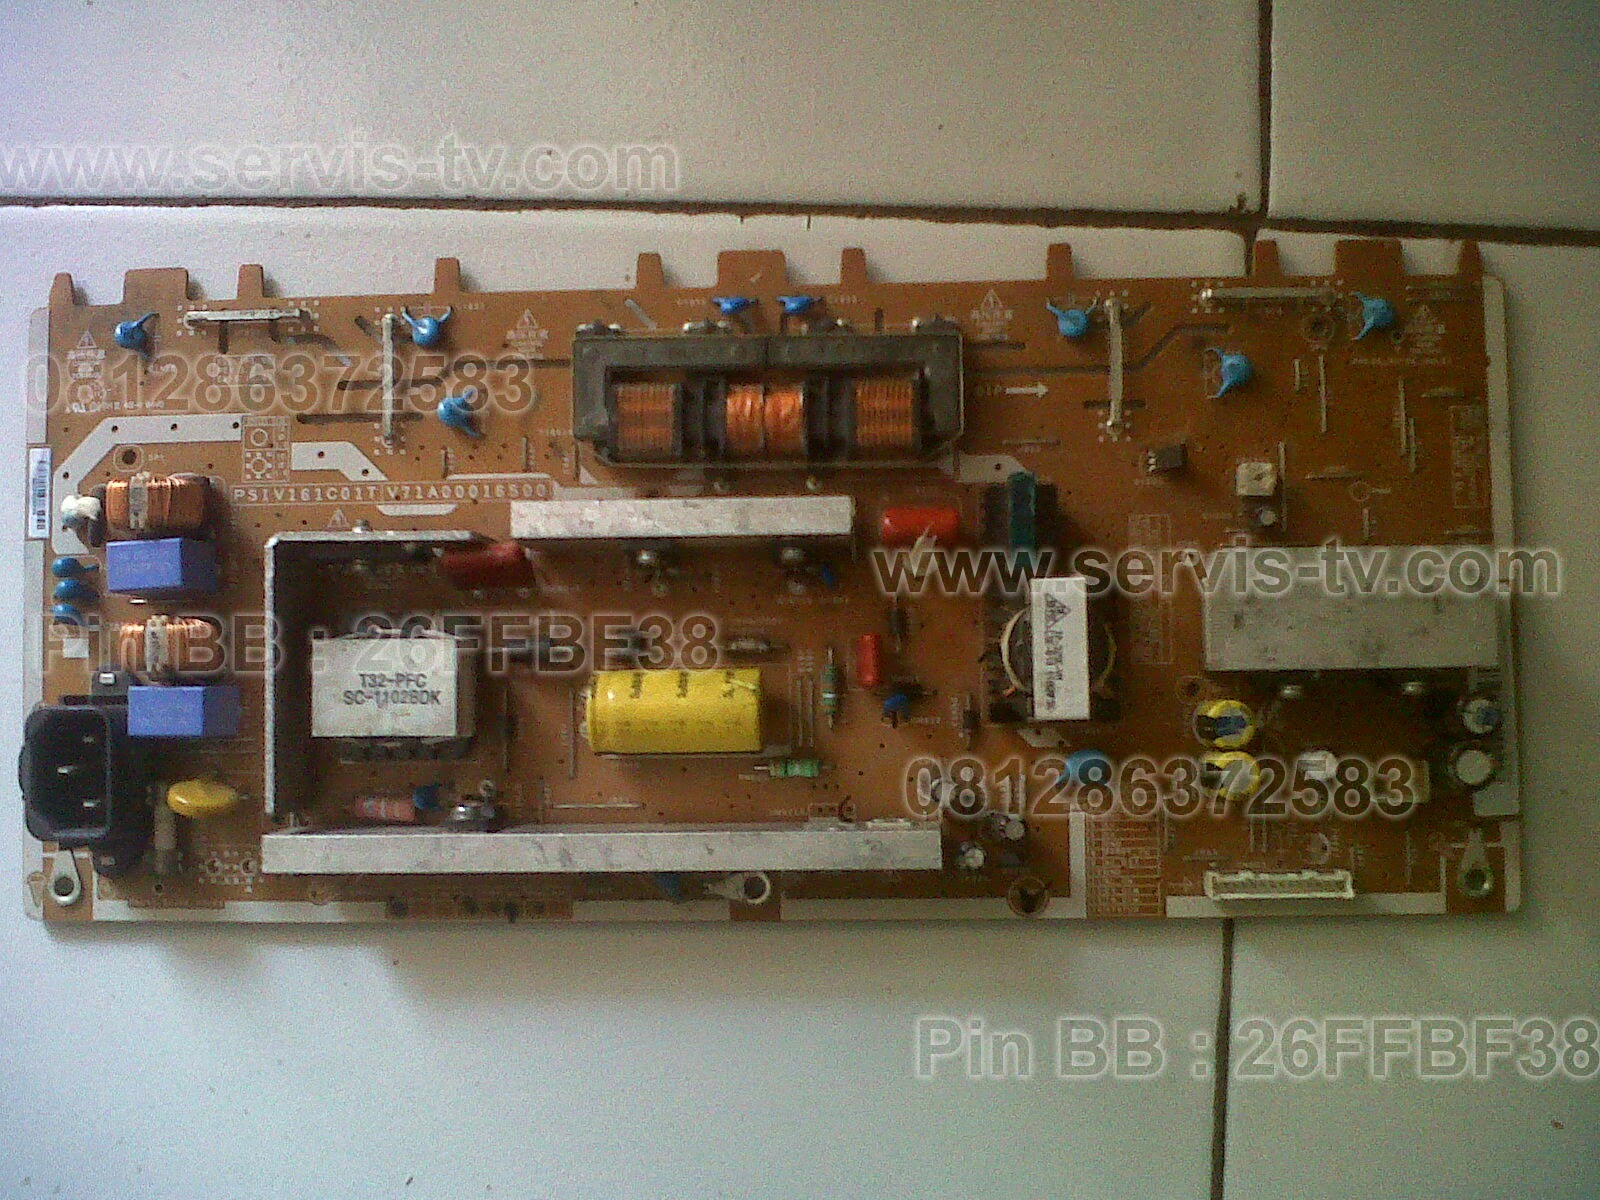 Power Supply Toshiba 32PB10E PSIV161C01T/V71A00016500